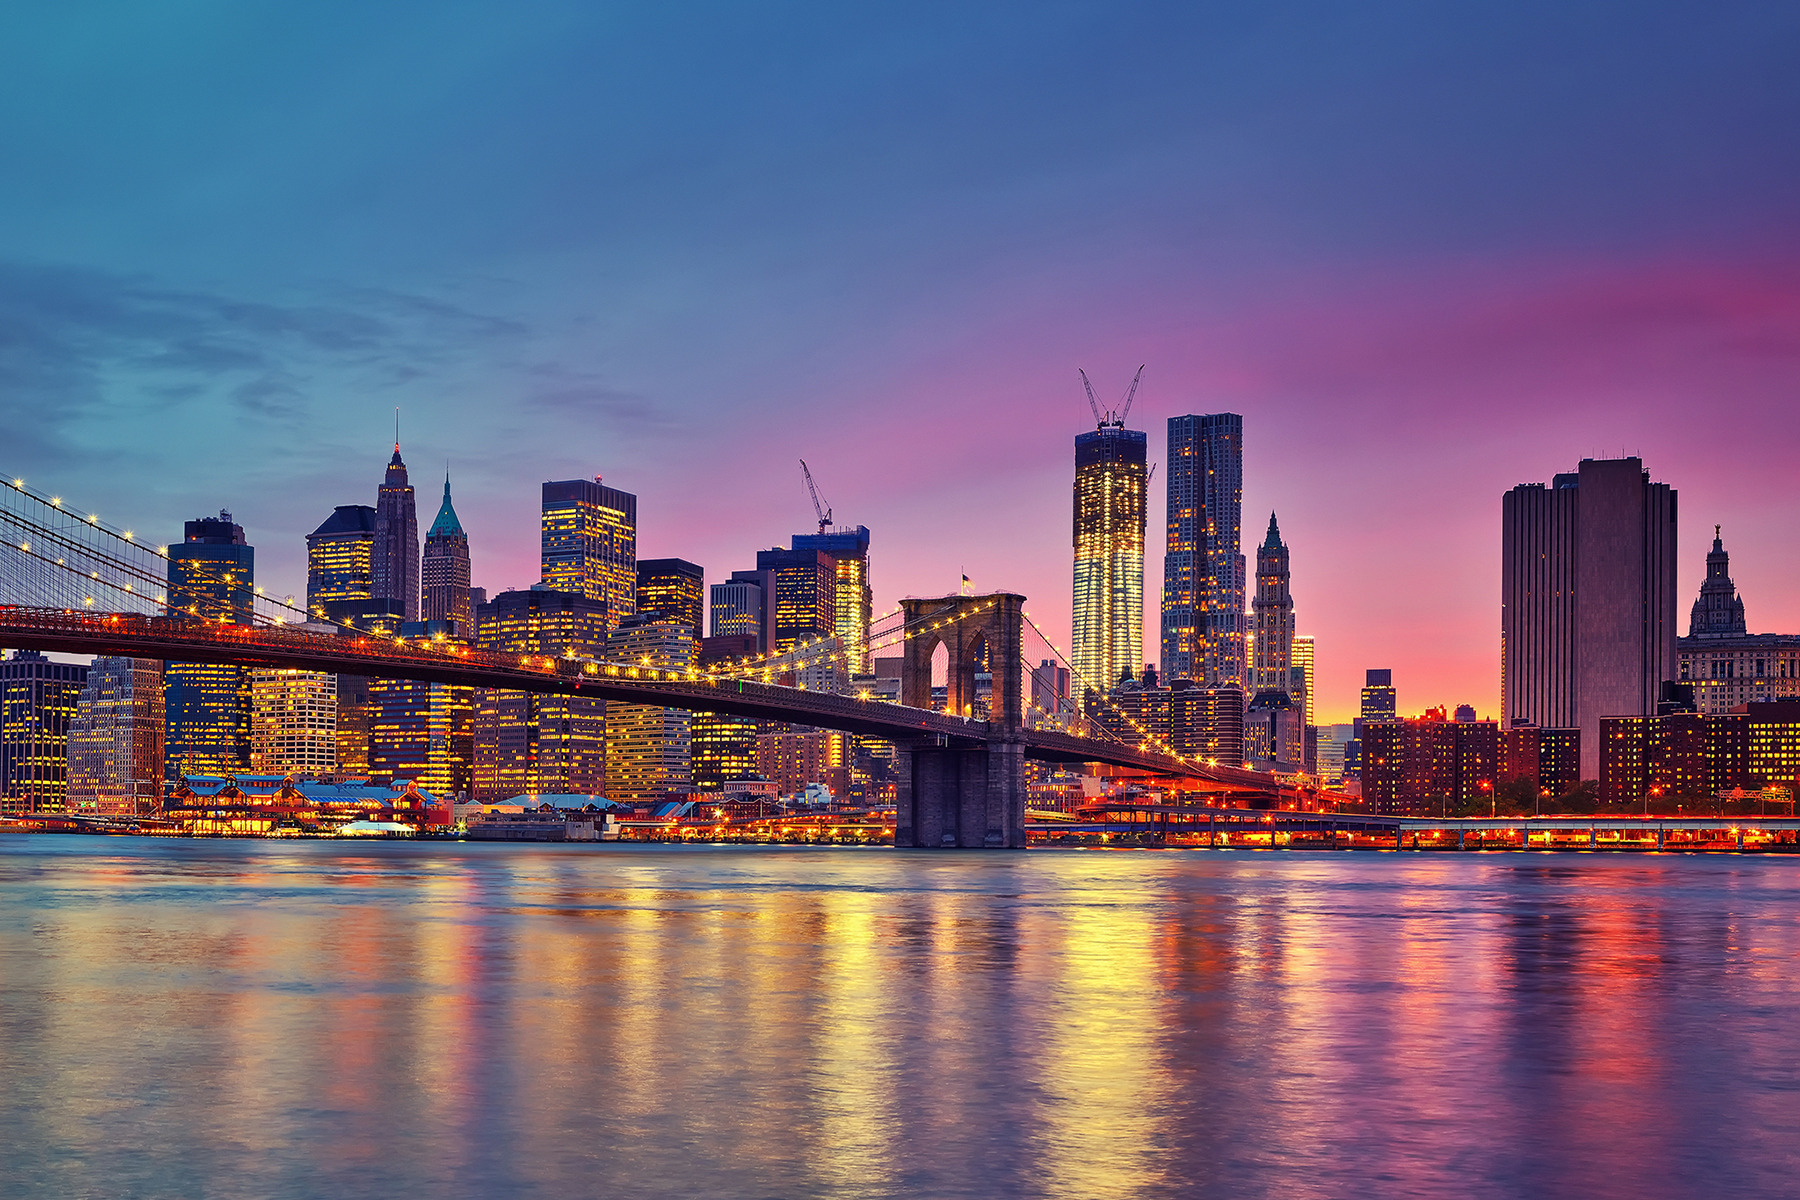 US_New York City.jpg